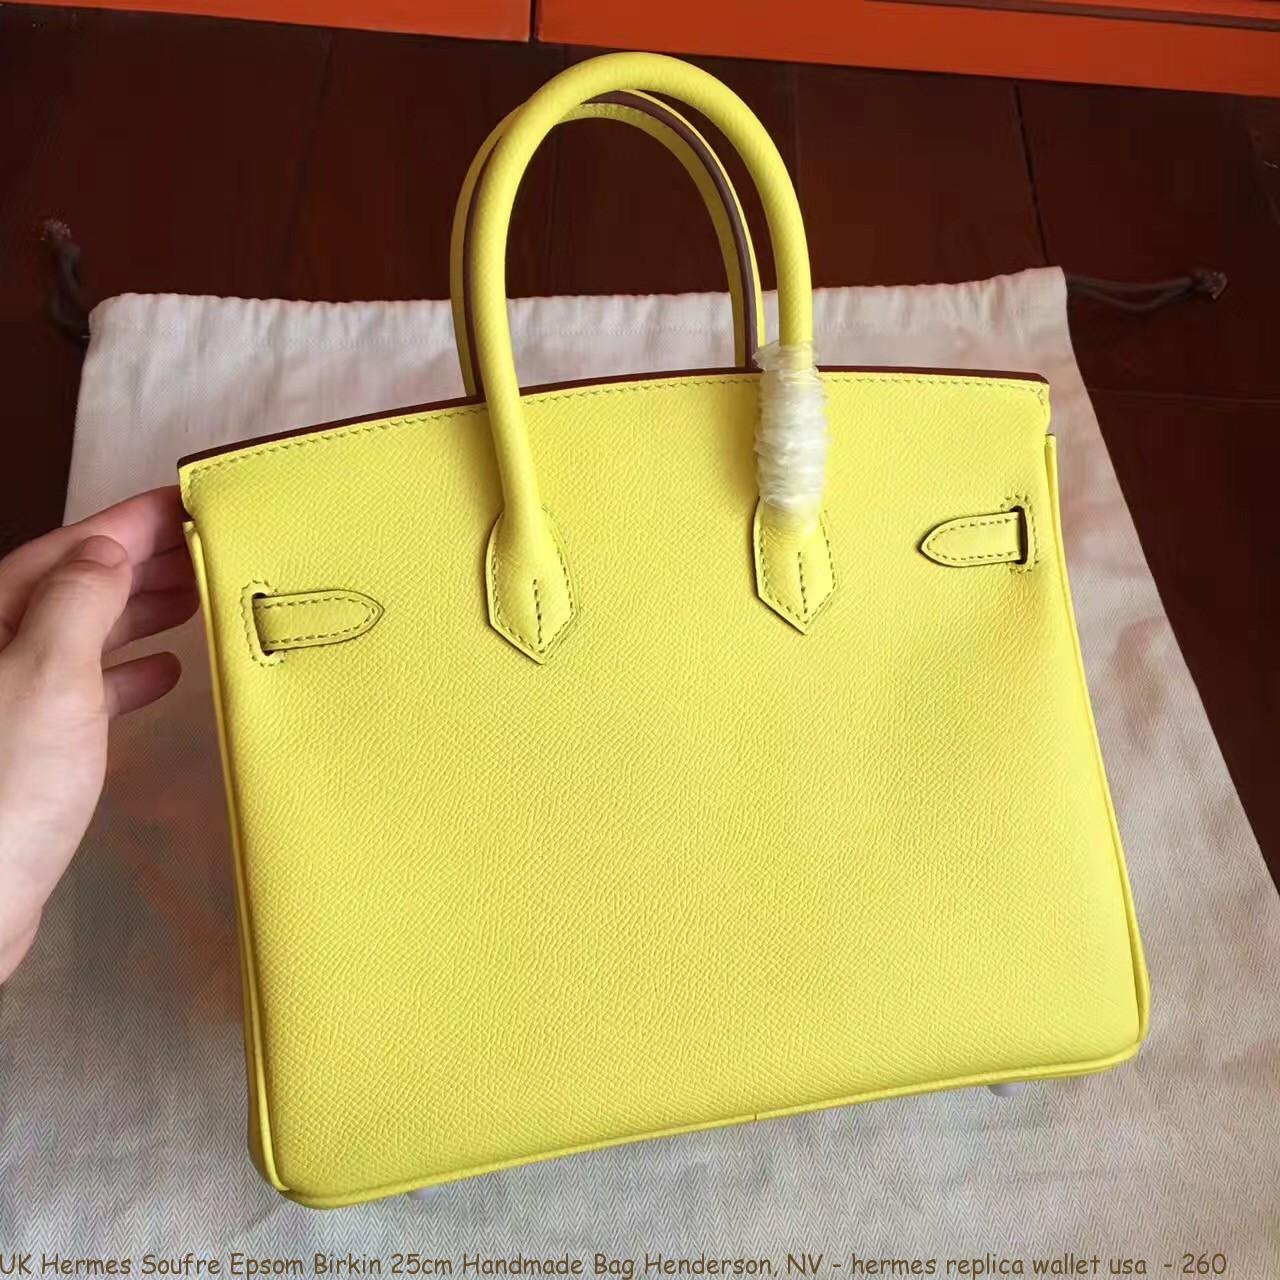 7faec2f1fad8 UK Hermes Soufre Epsom Birkin 25cm Handmade Bag Henderson